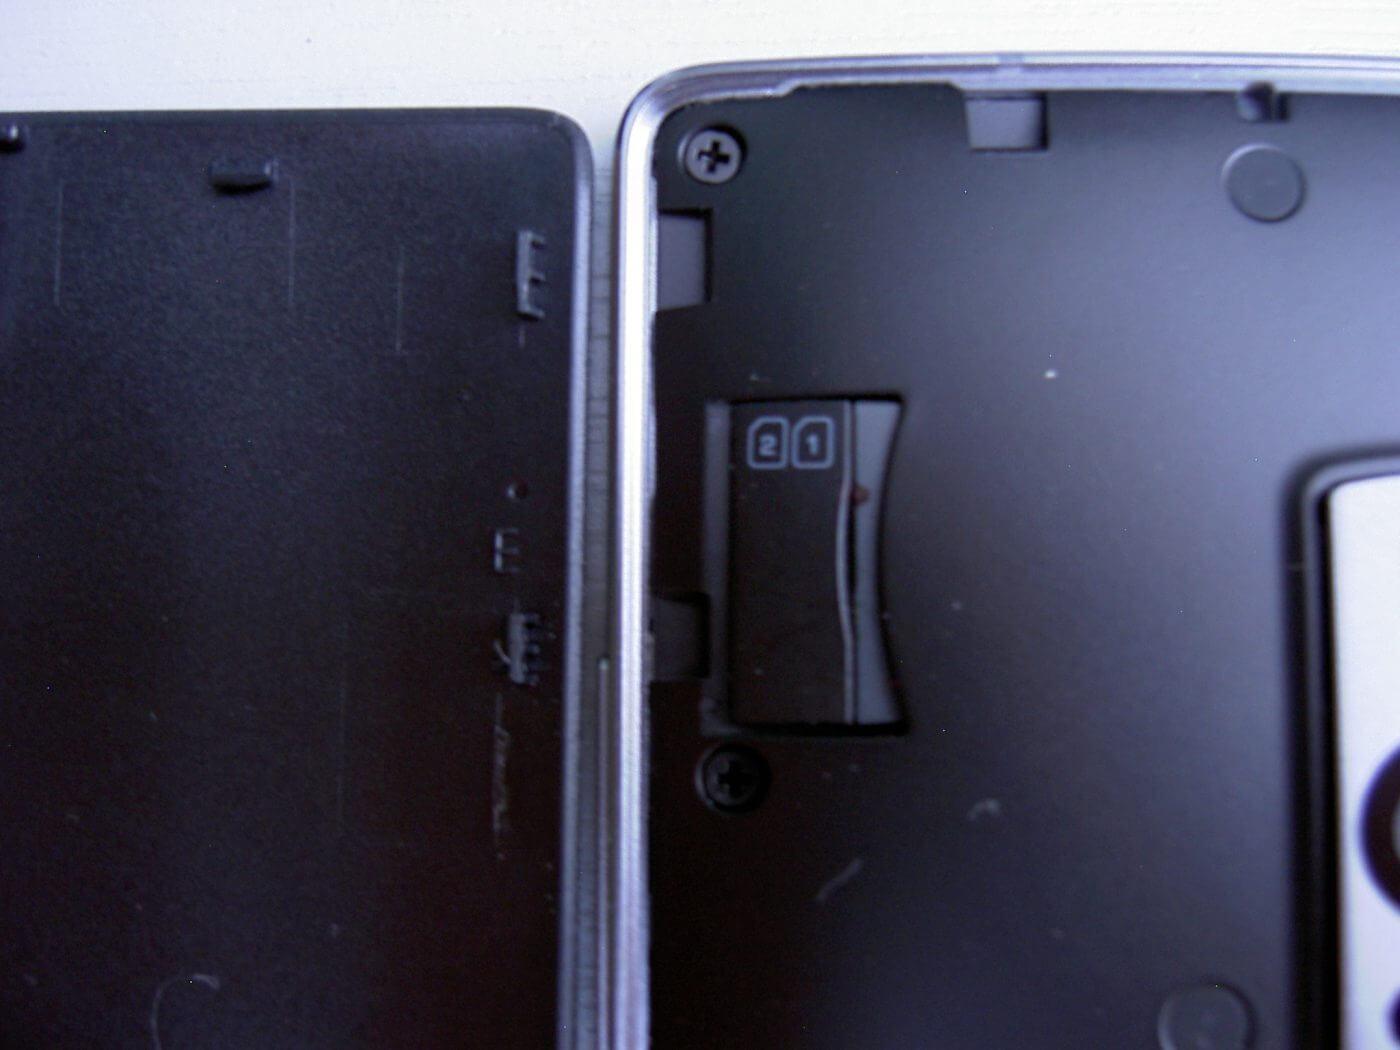 OnePlus 2 StyleSwap